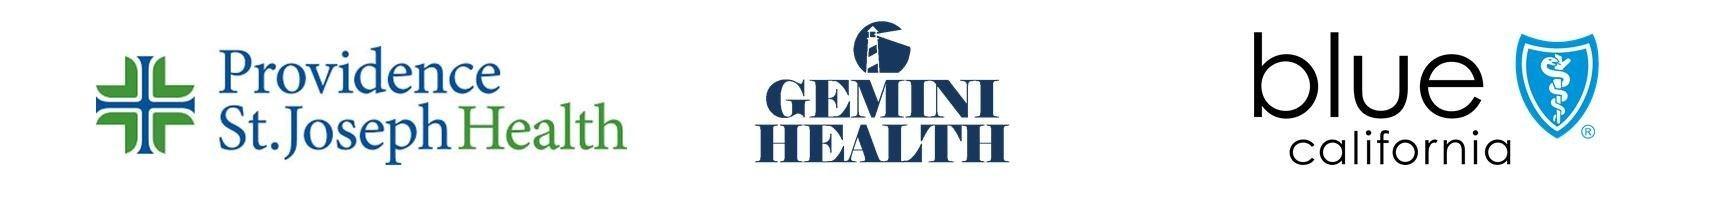 Providence St  Joseph Health, Blue Shield of California Team Up to